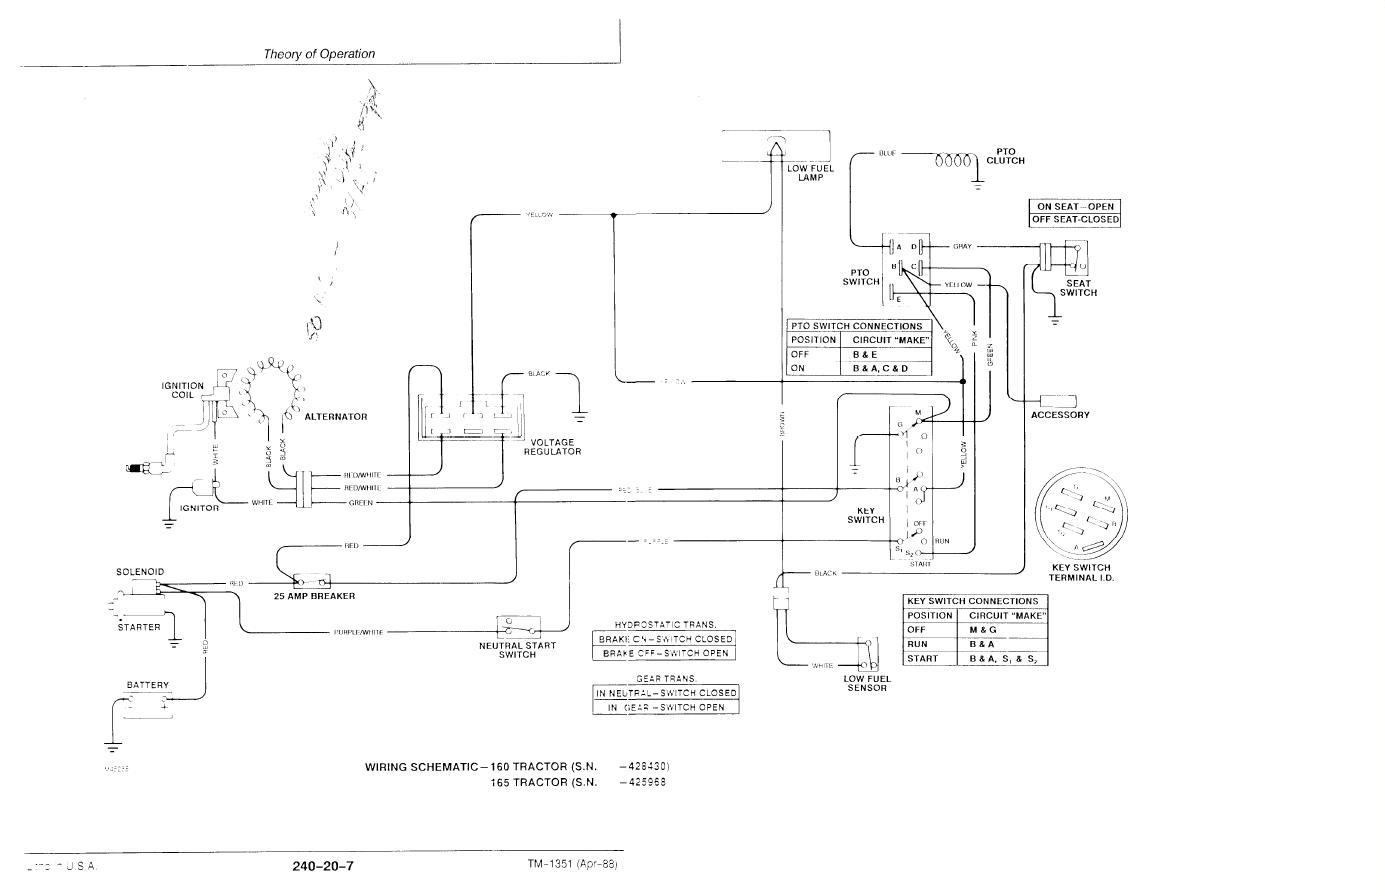 john deere 111 pto wiring diagram wiring diagram wiring diagram for john deere sabre the